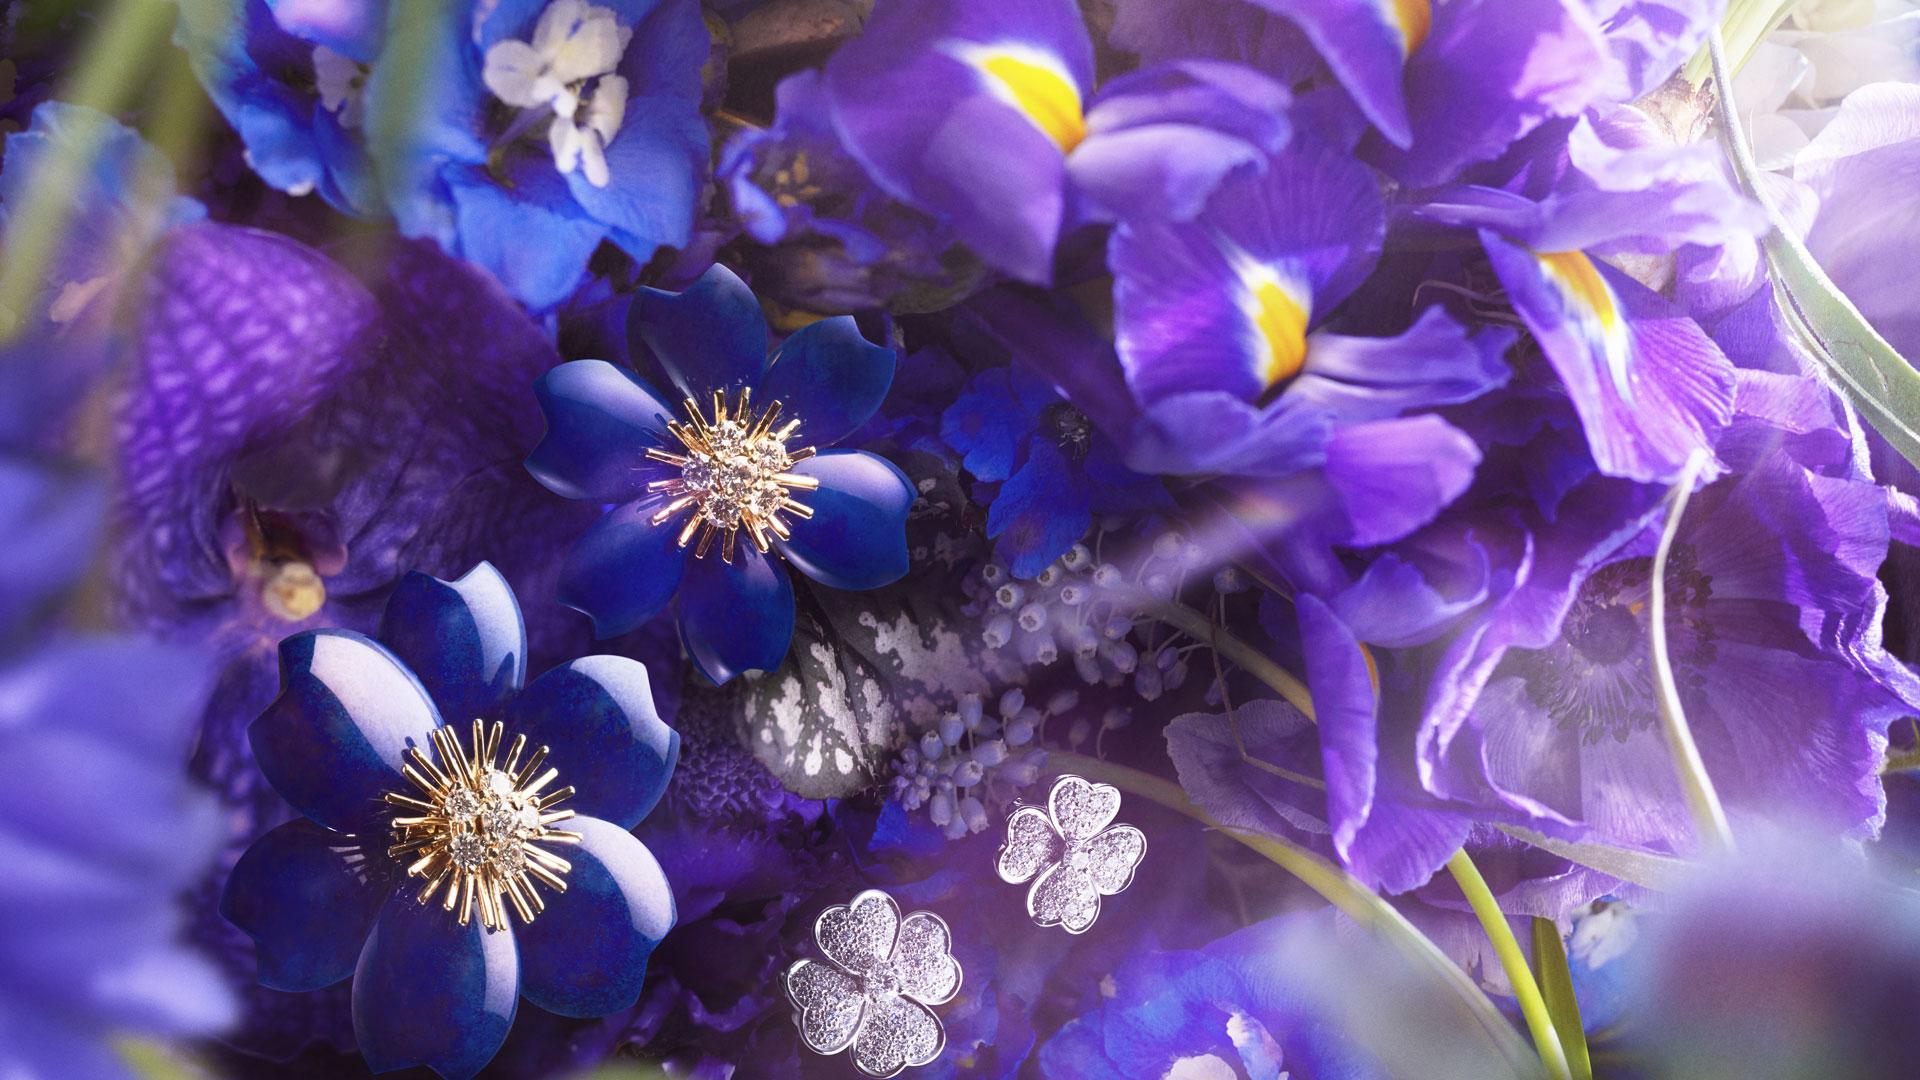 Mika Ninagawa, Livre Florae, 2000024